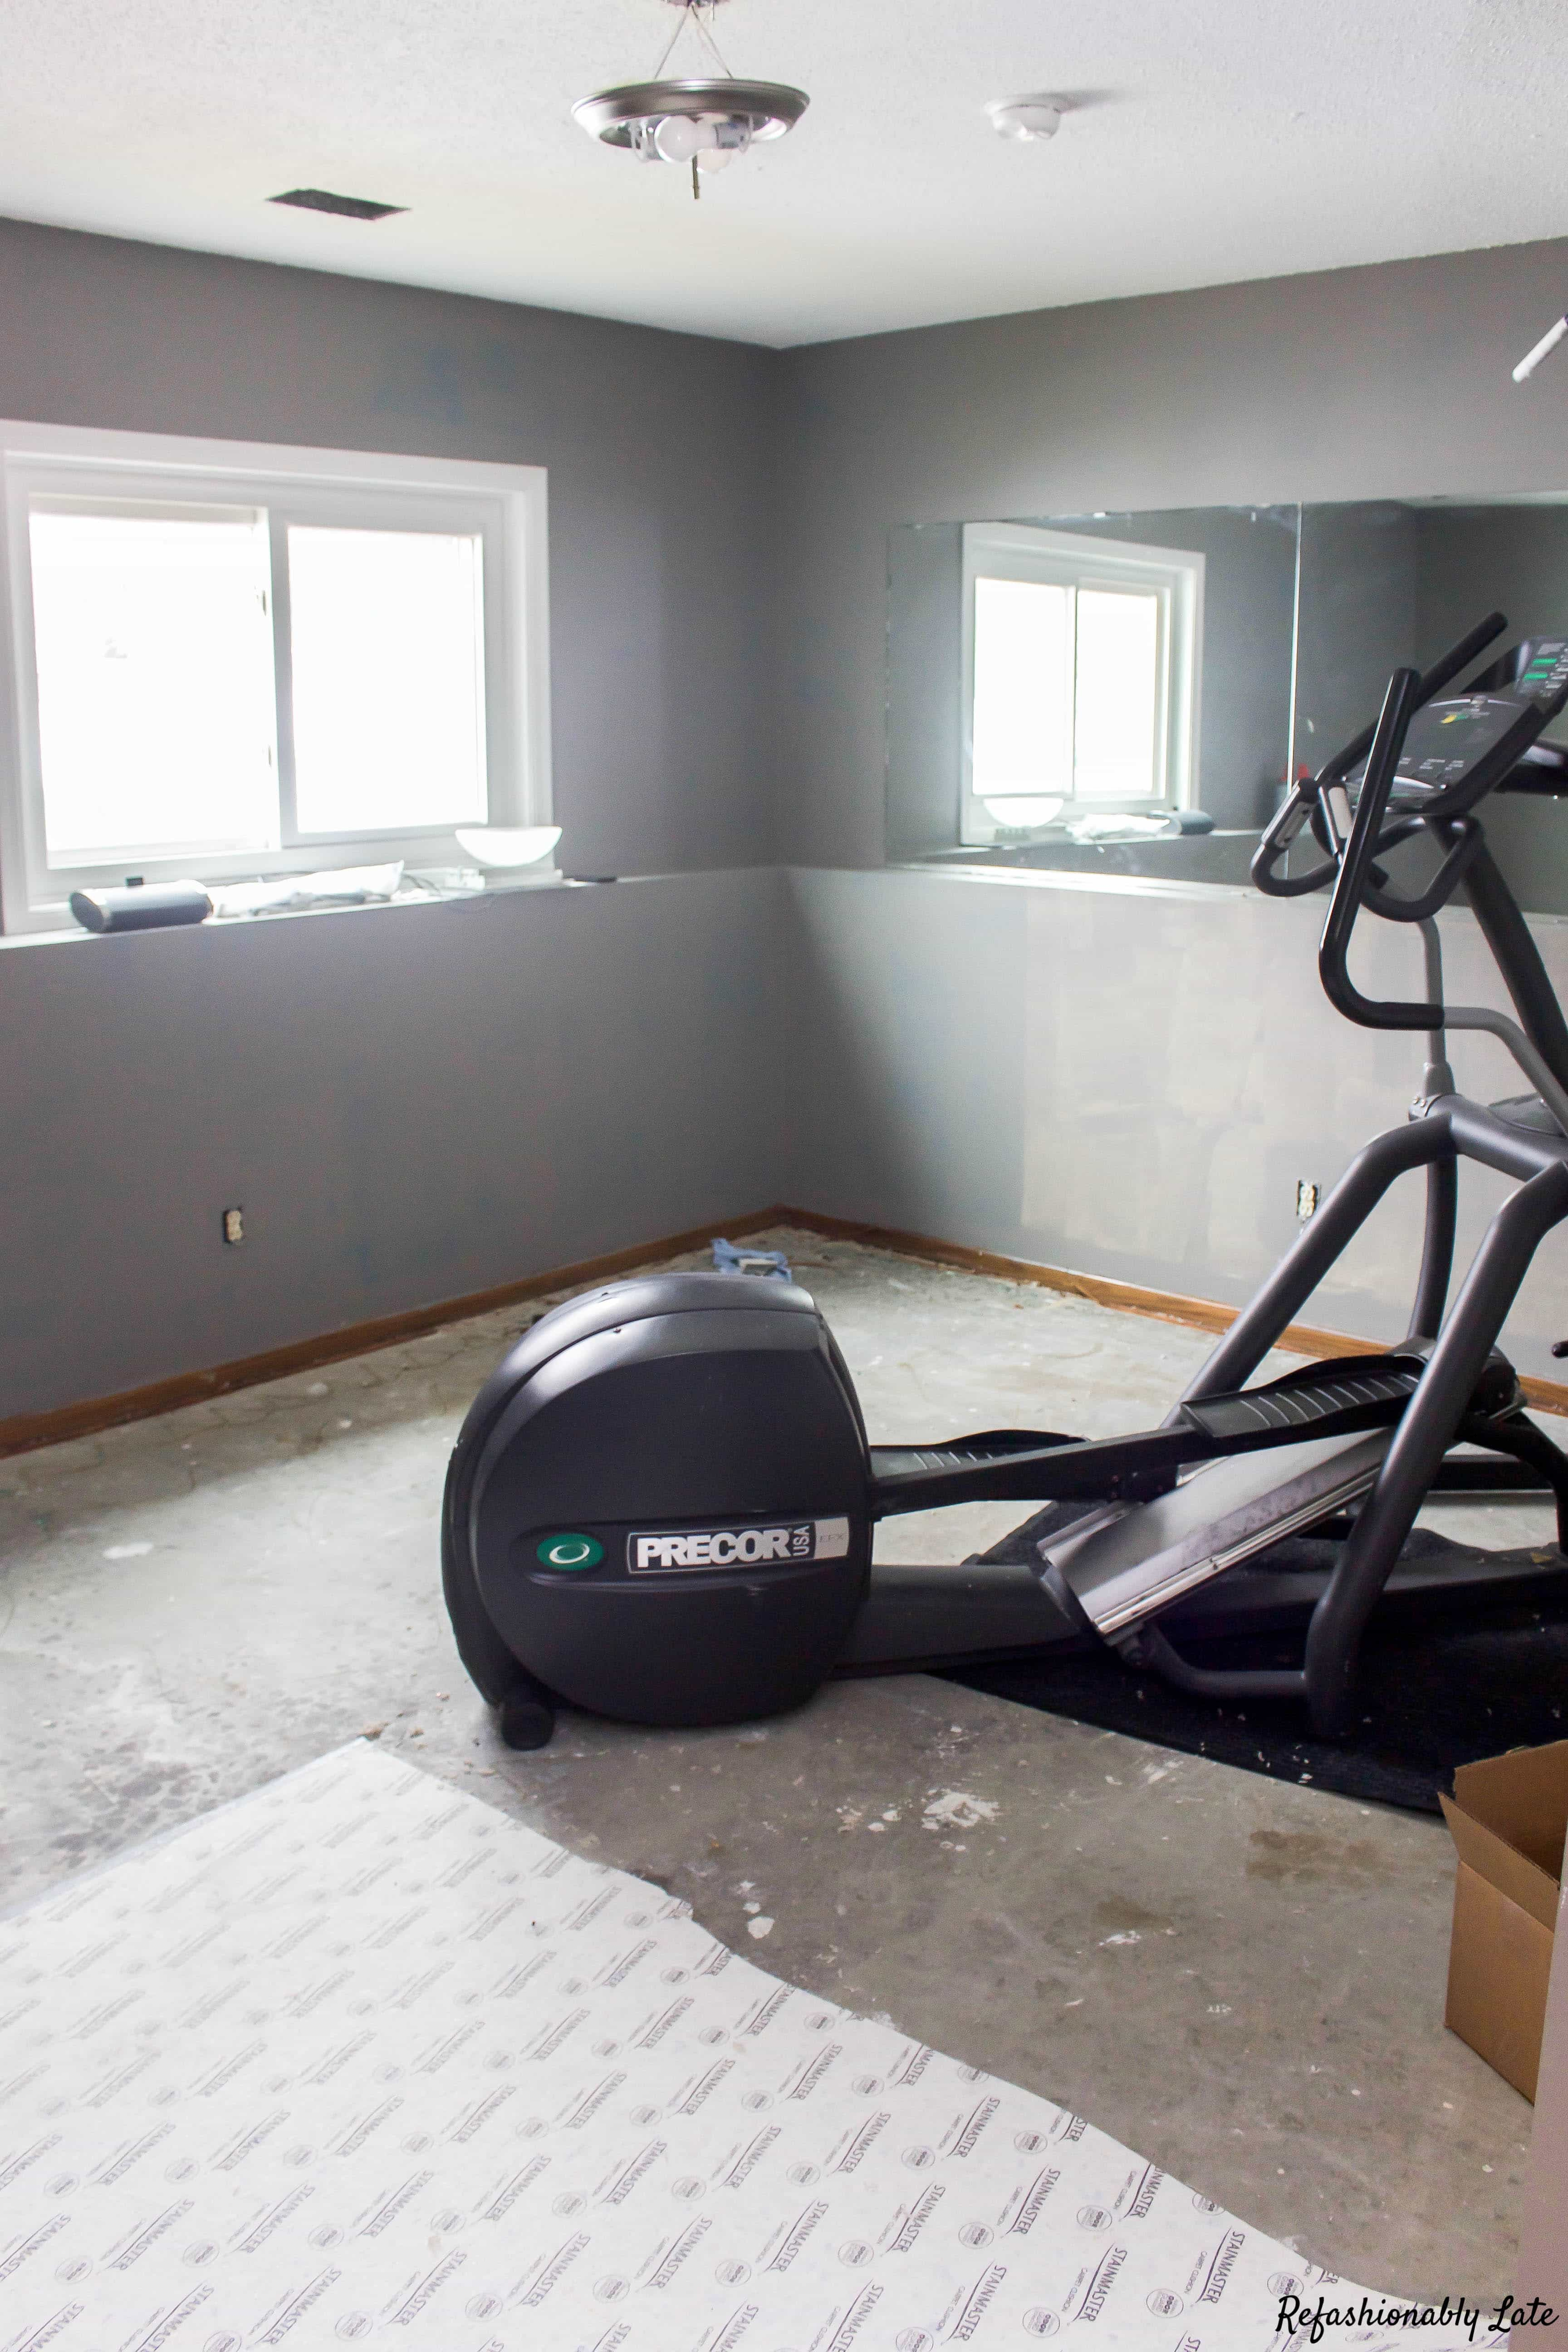 One Room Challenge Week 2 Gym/Guest Room - www.refashionablylate.com